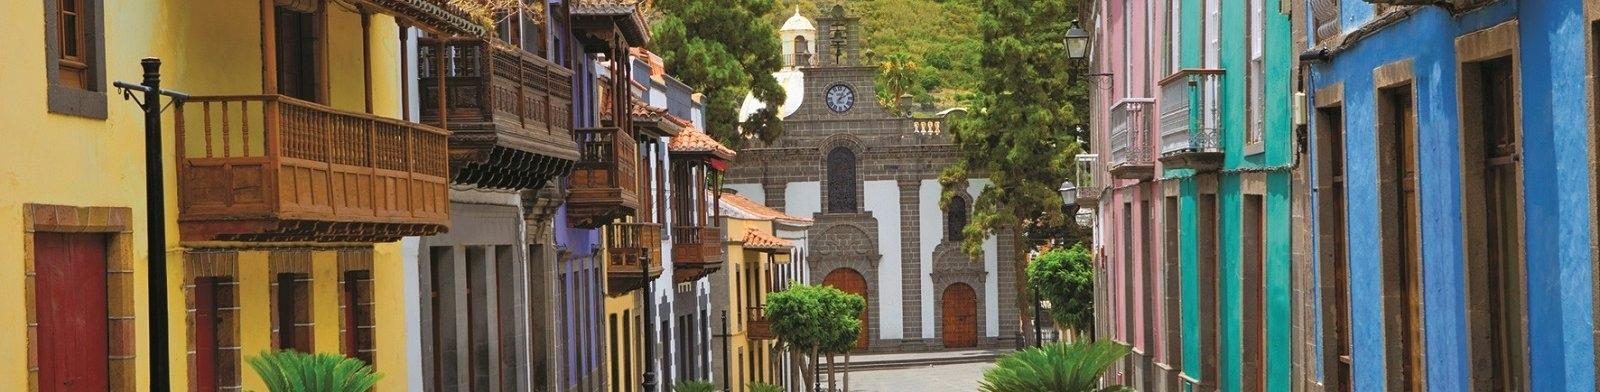 Street in Gran Canaria